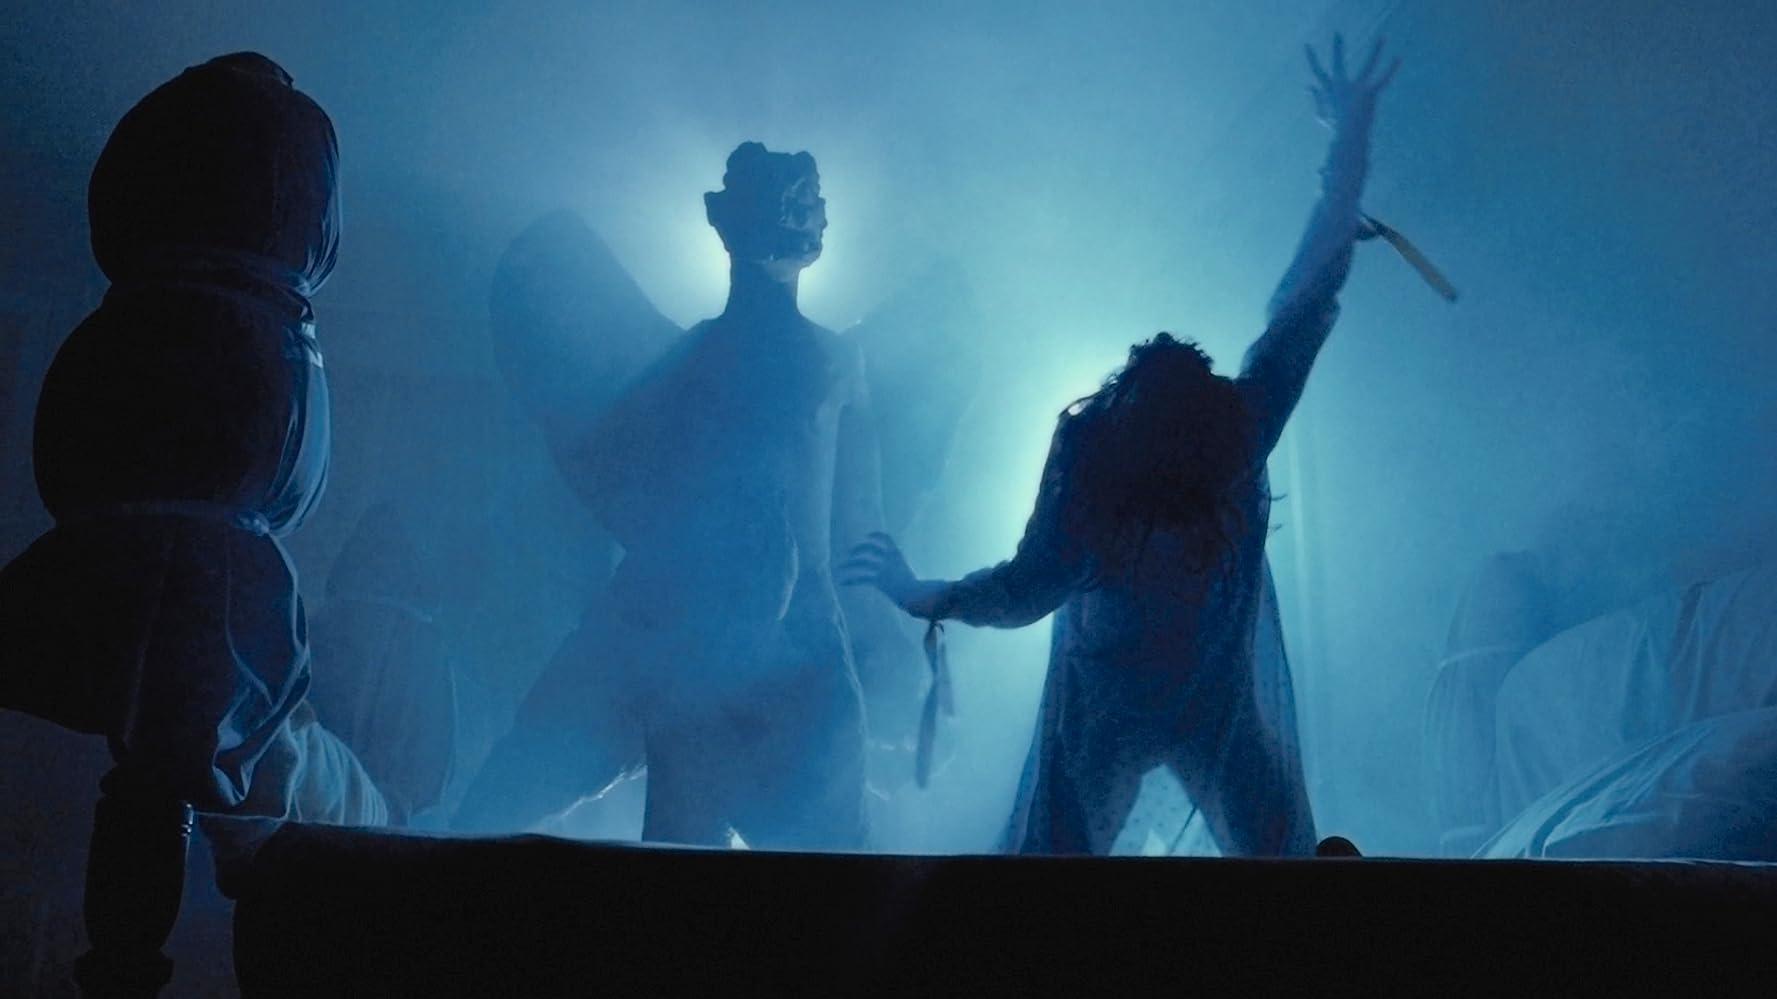 Linda Blair in The Exorcist (1973)